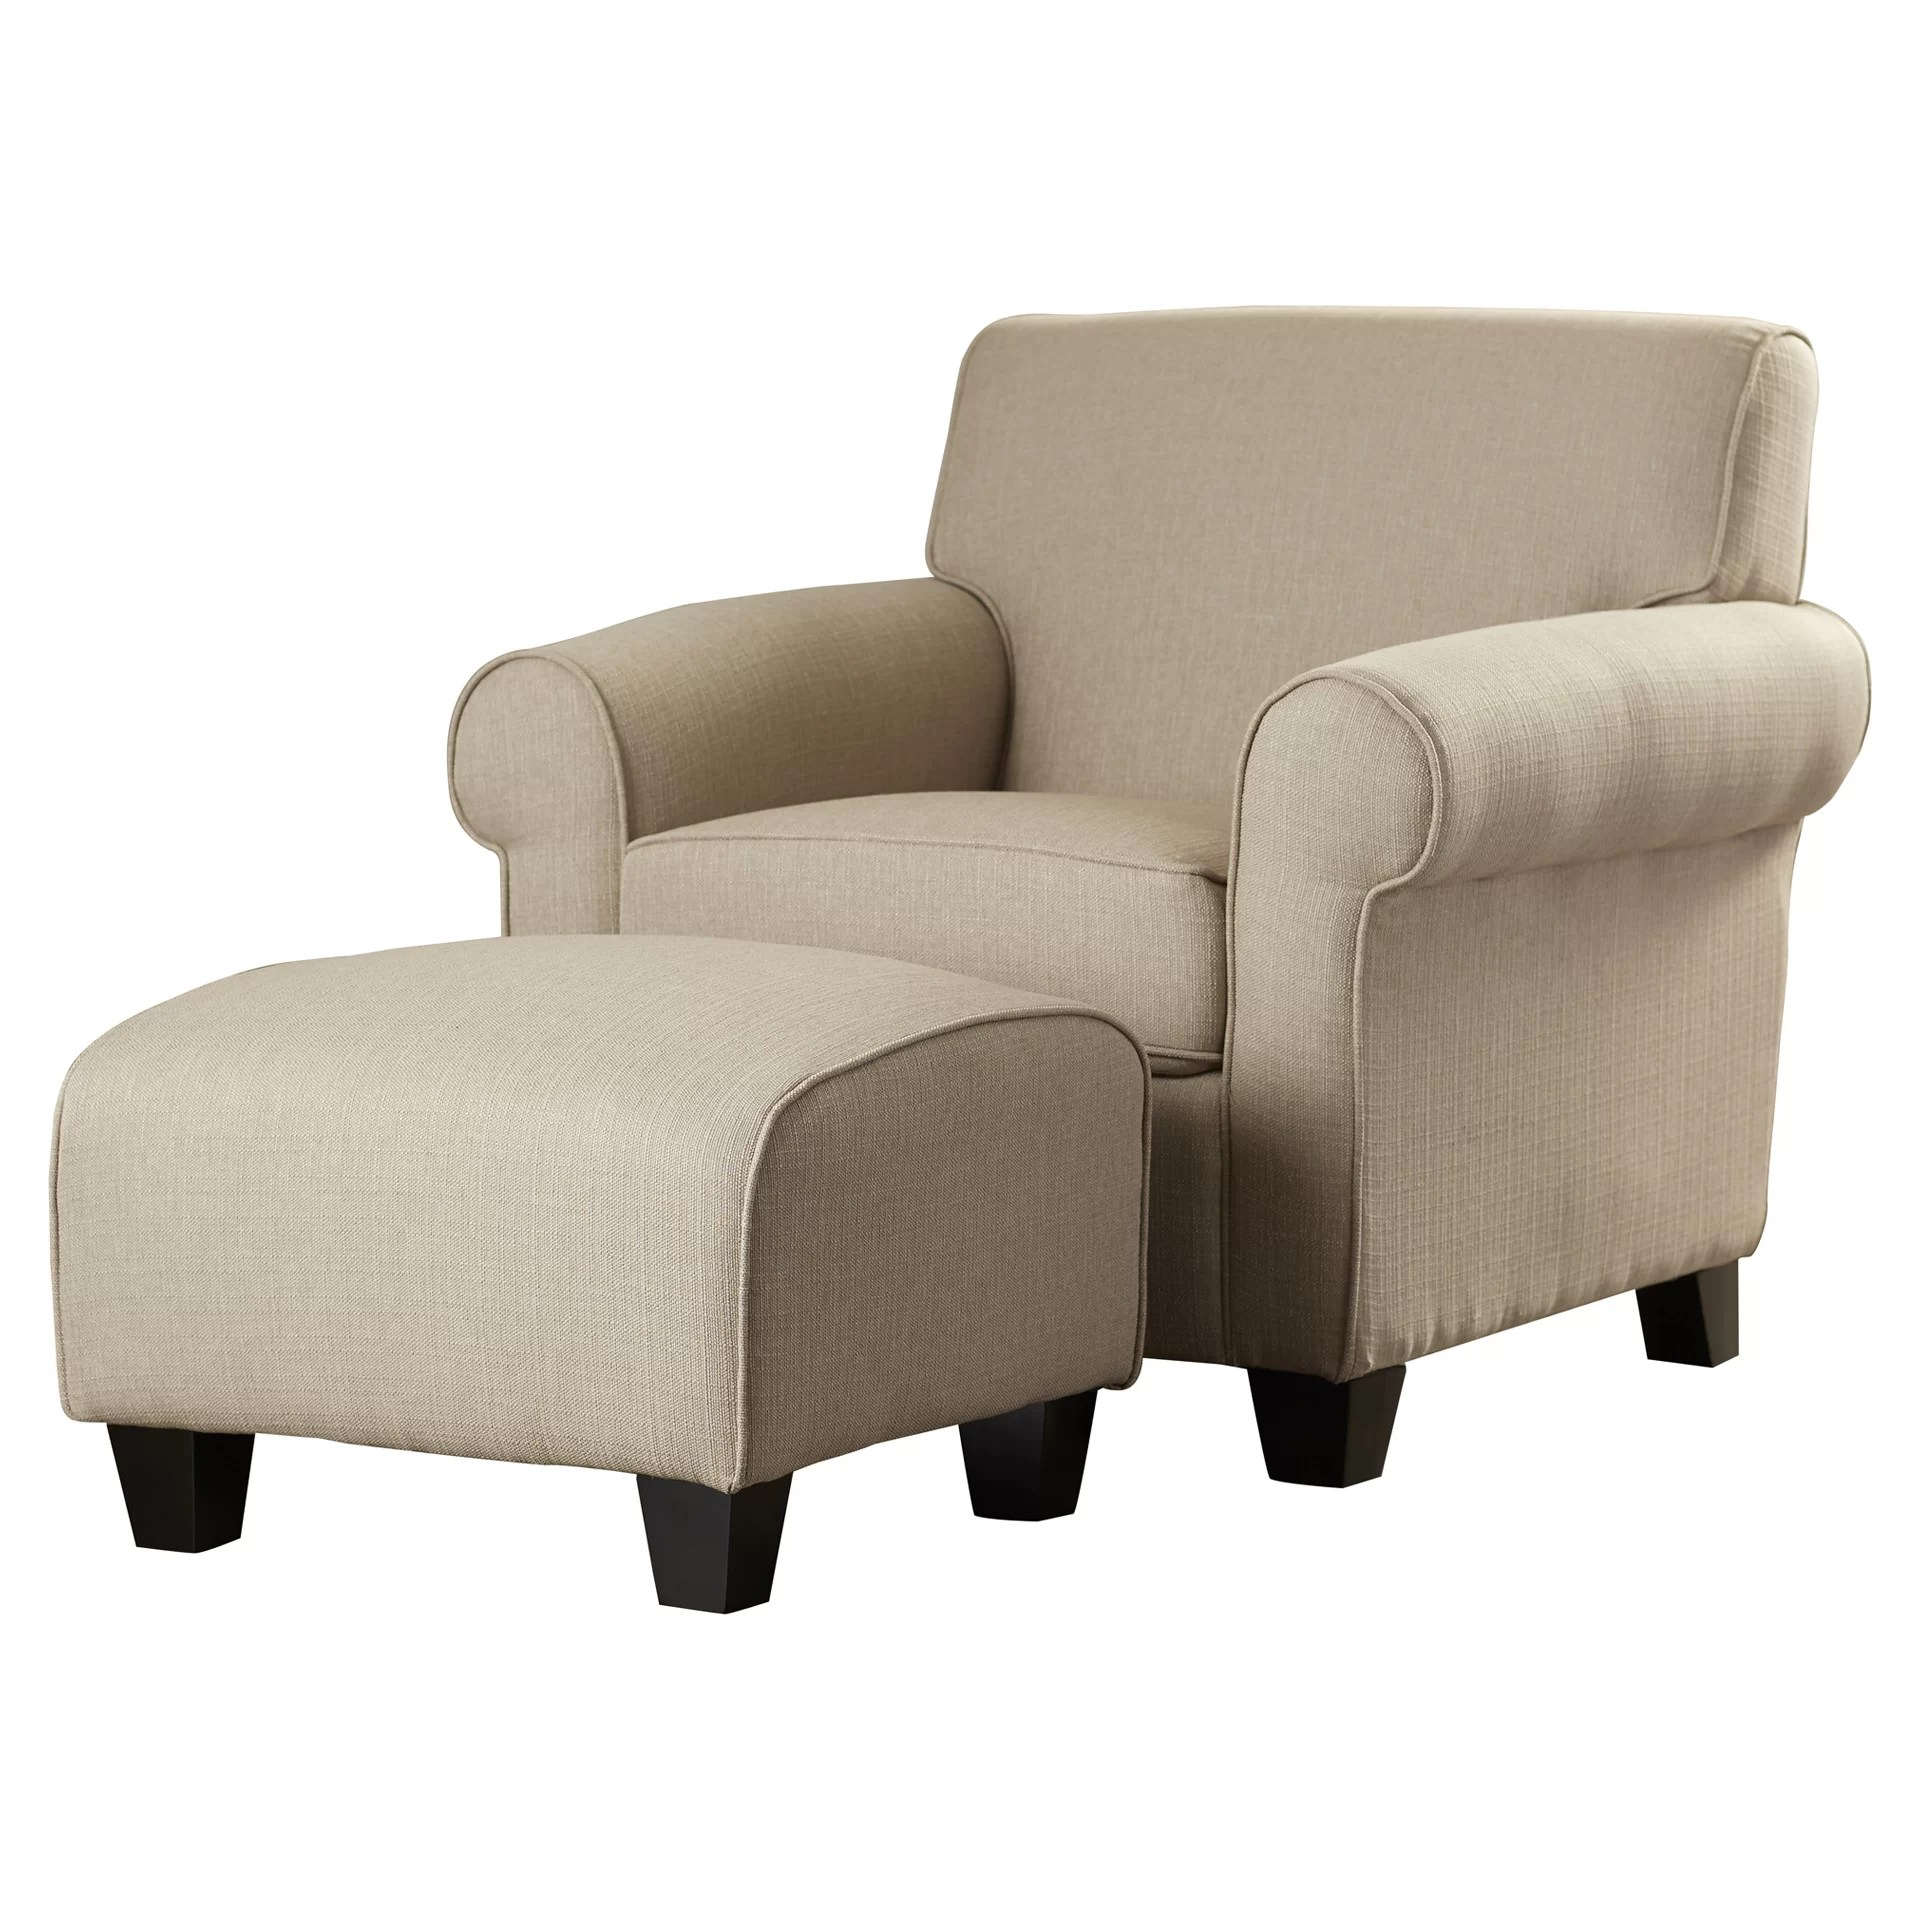 Alcott Hill Oldbury Arm Chair and Ottoman & Reviews